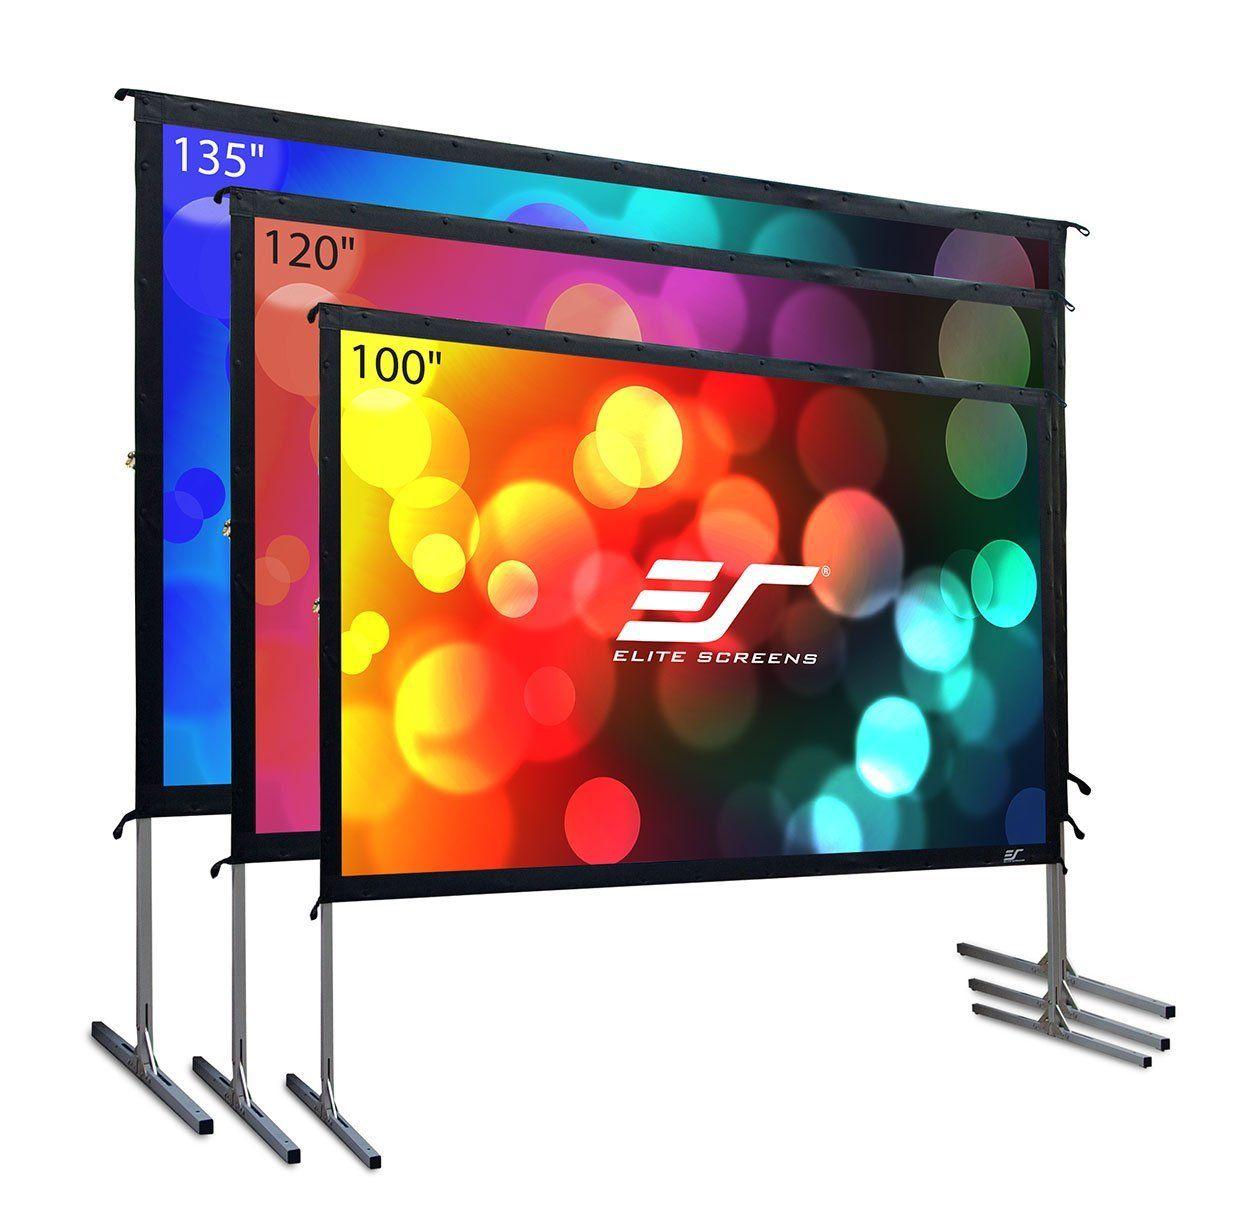 Amazon Com Elite Screens Yard Master 2 120 Inch Outdoor Projector Screen With Stand 16 9 8k 4k Outdoor Projector Screens Outdoor Projector Projection Screen